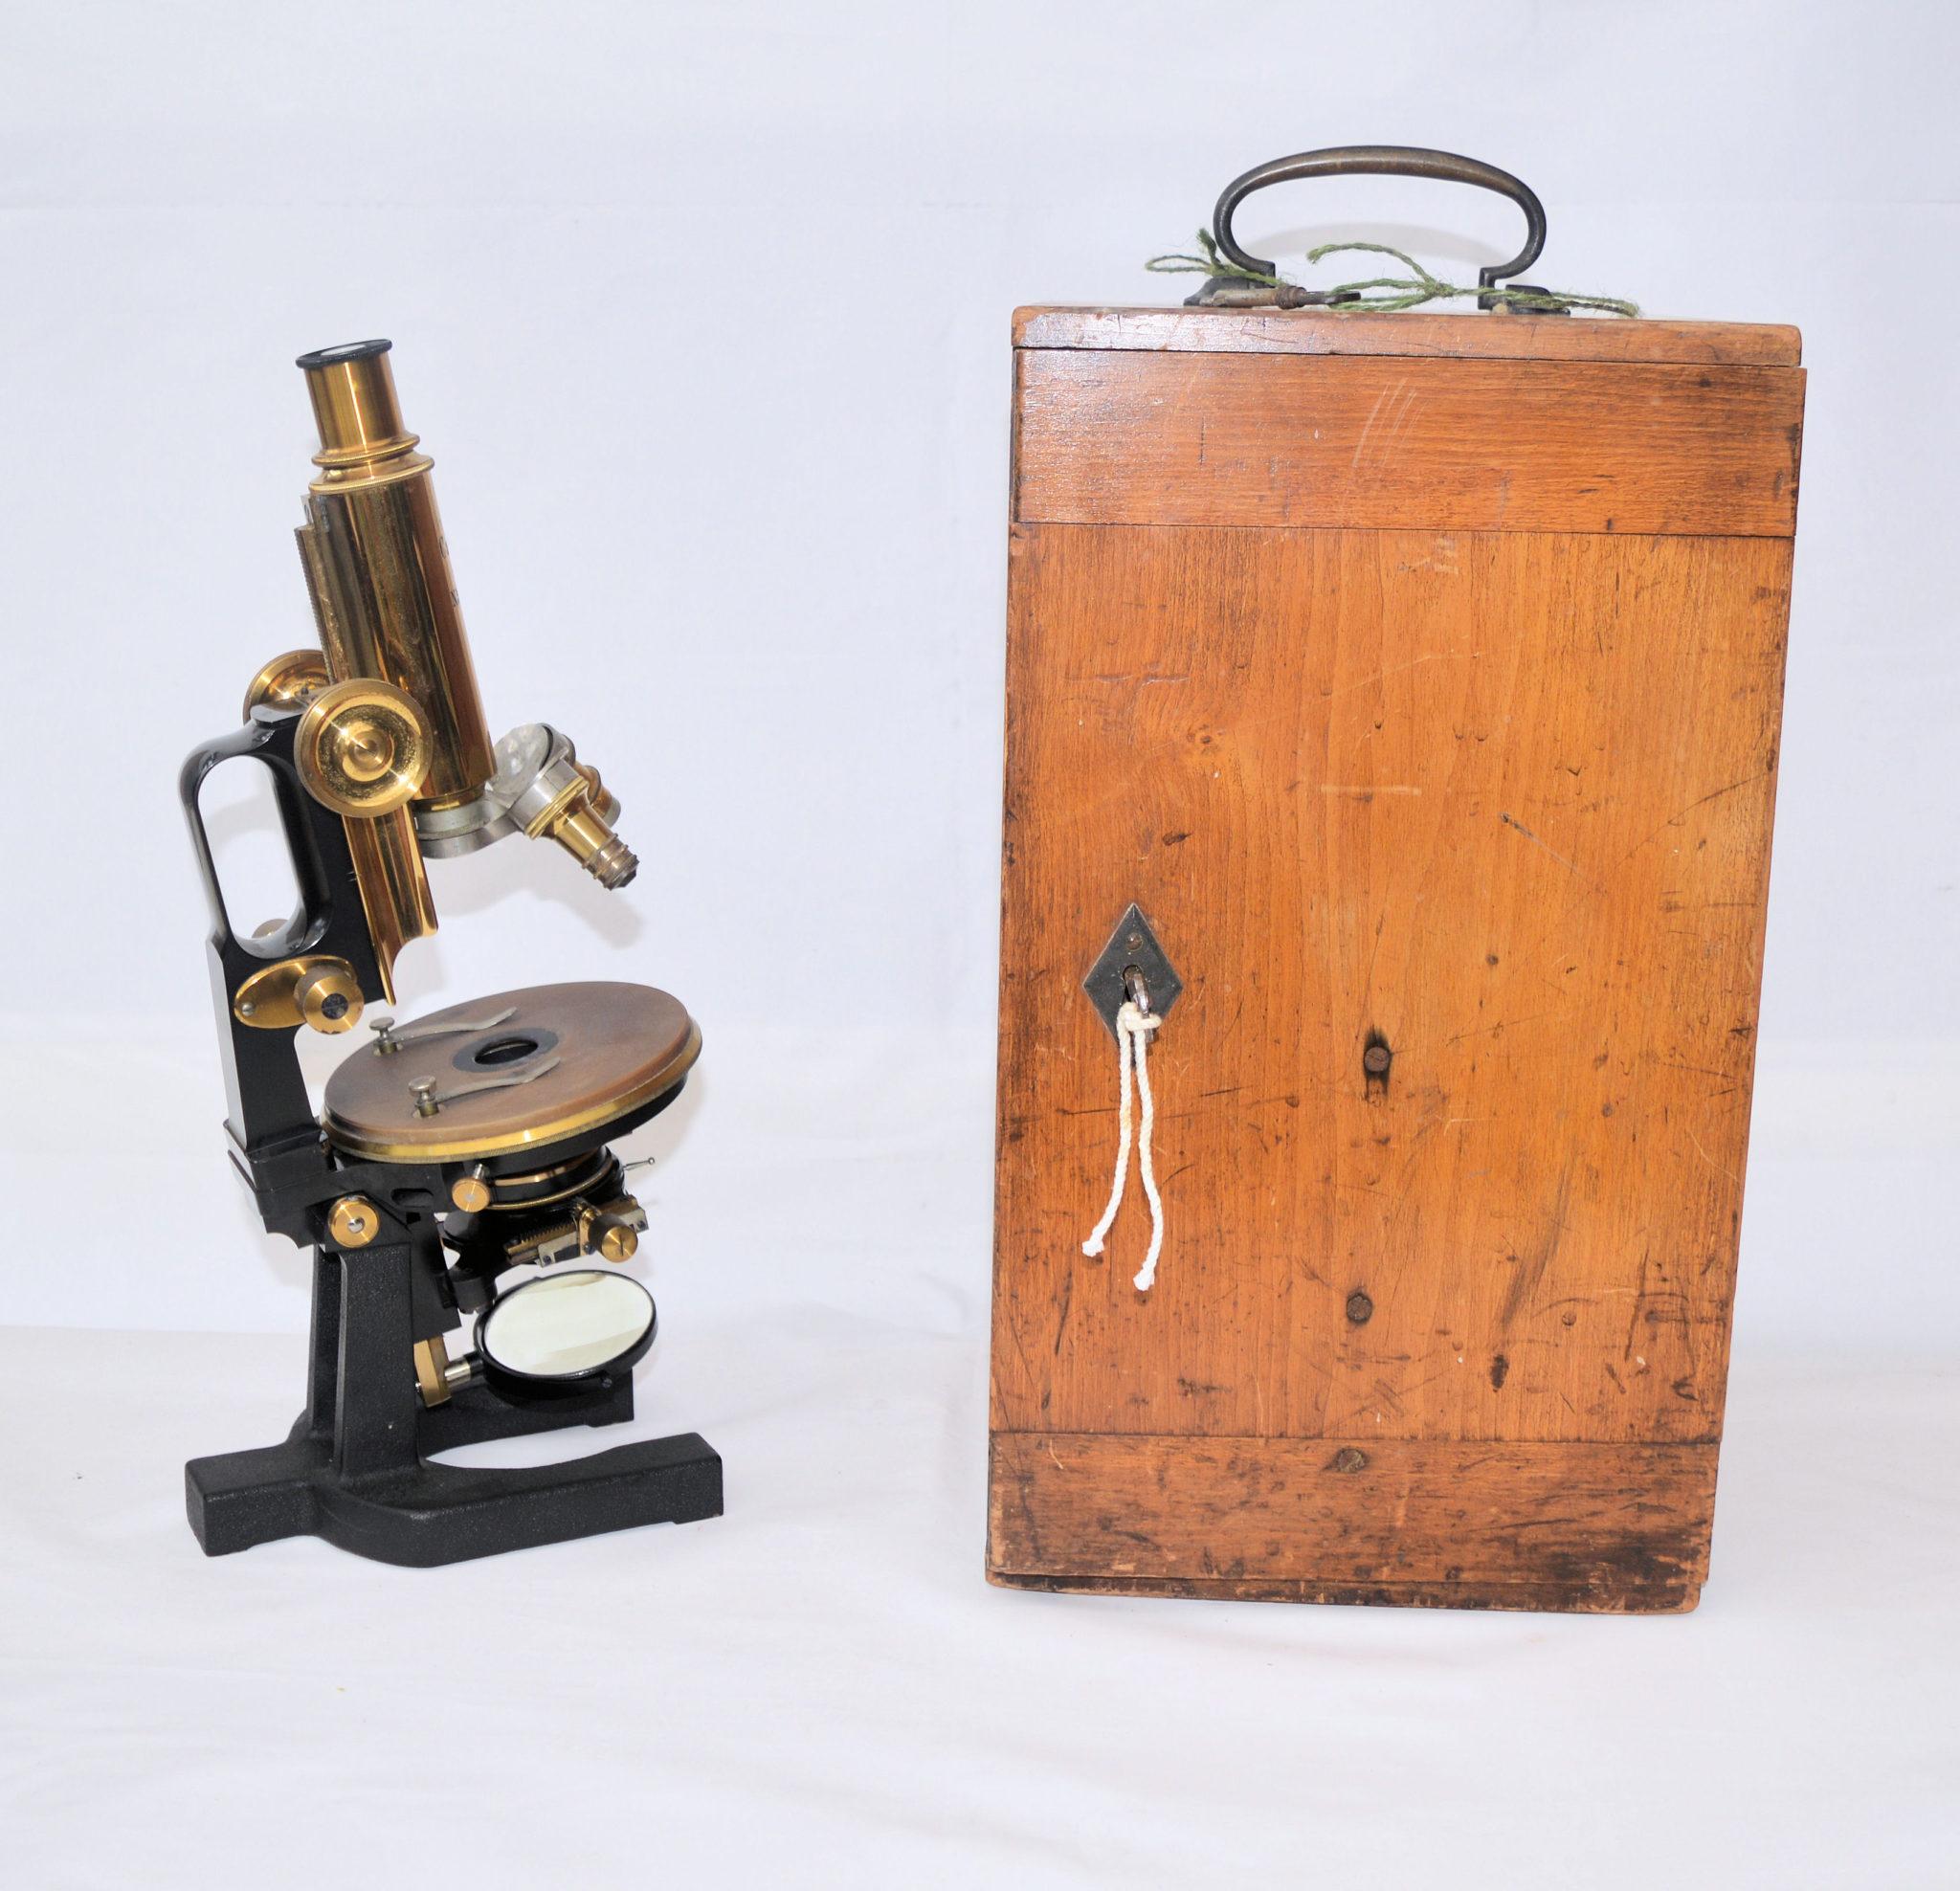 Zeiss Jug Handle microscope in case.